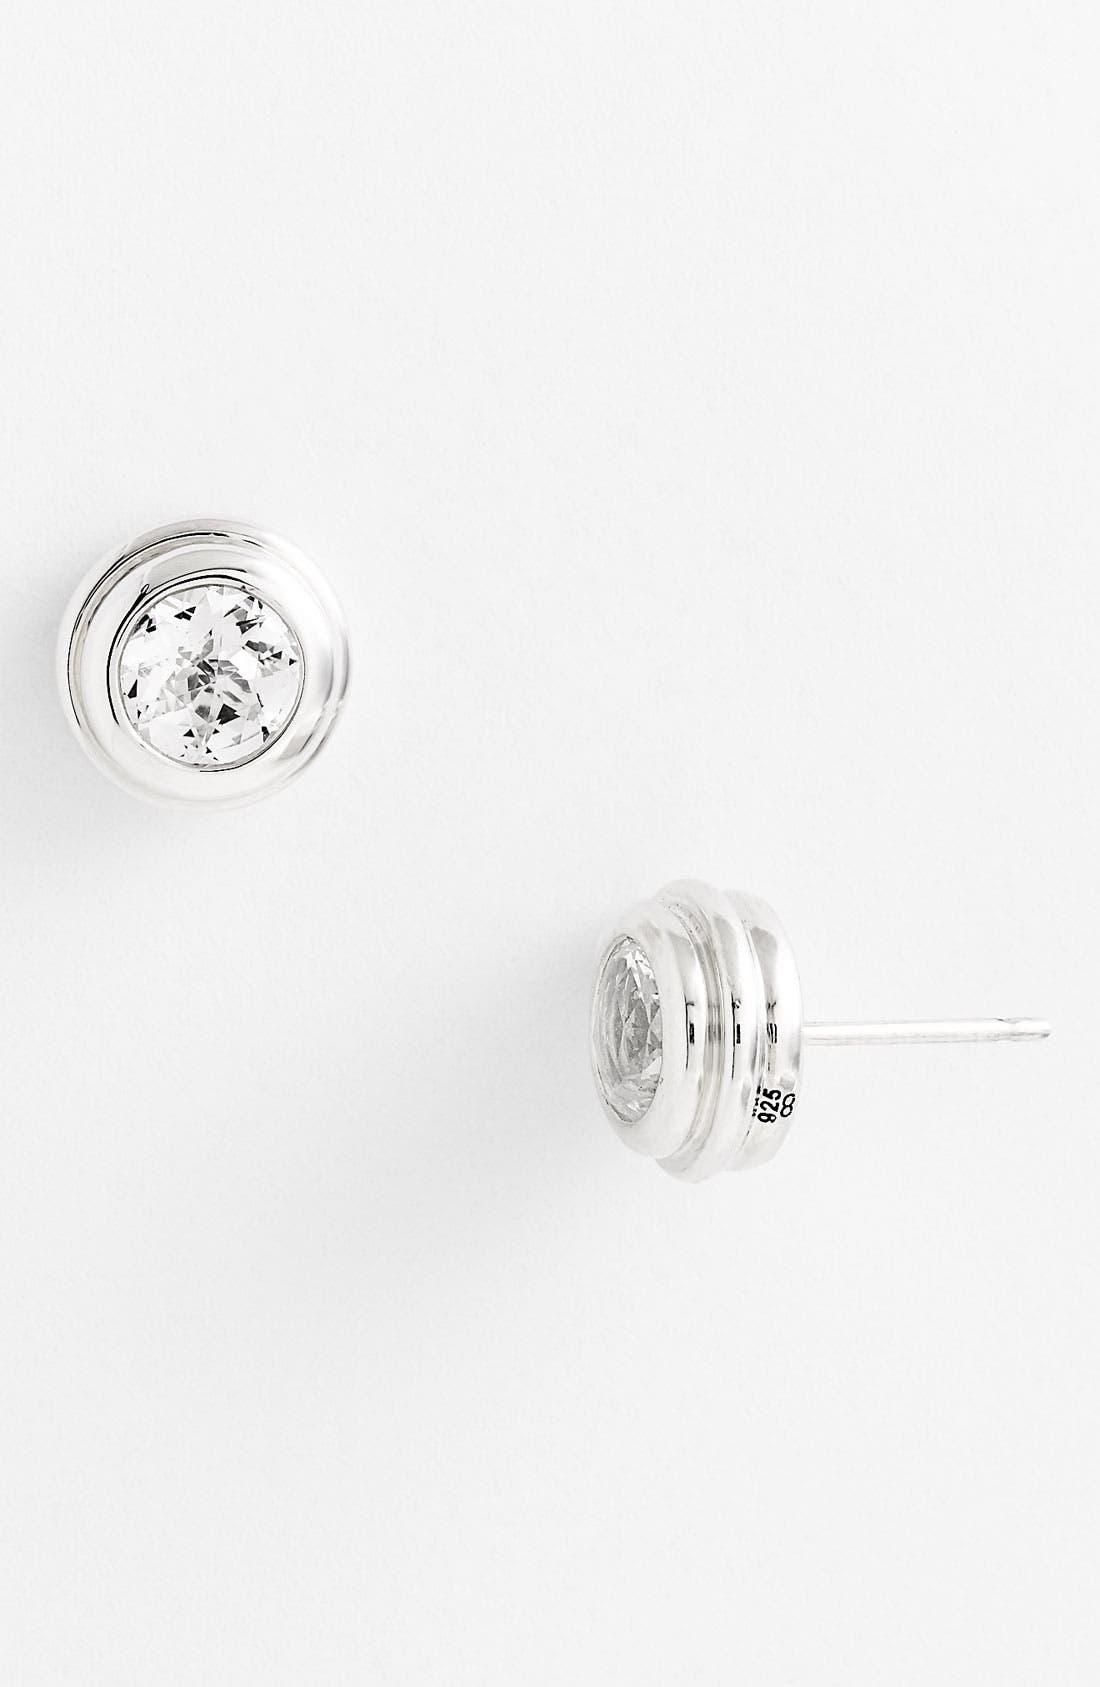 Main Image - John Hardy 'Bedeg' Round Stud Earrings